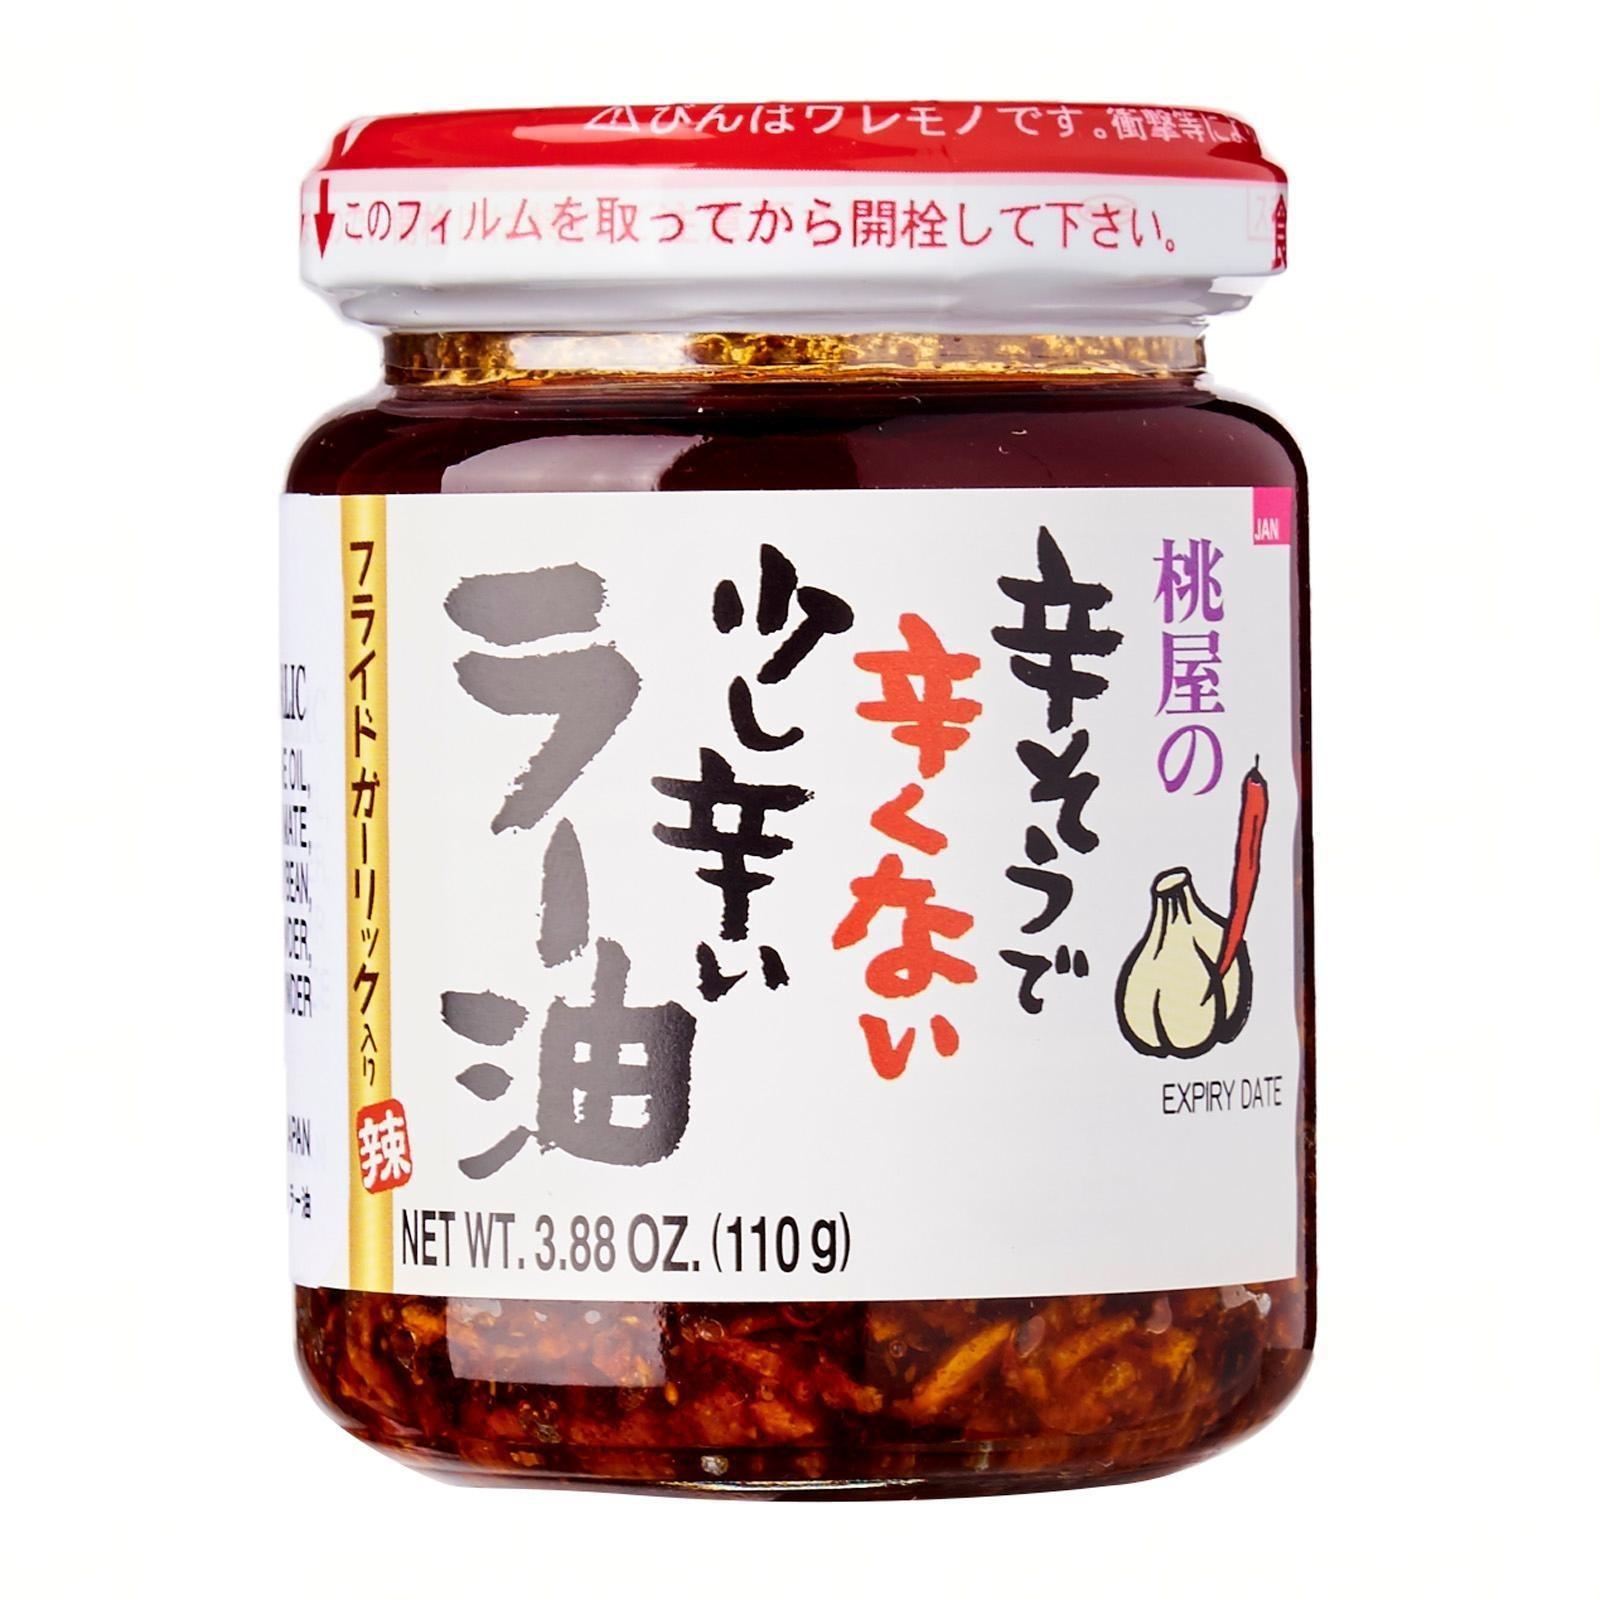 Momoya Taberu Layu Seasoned Oil With Red Pepper And Garlic